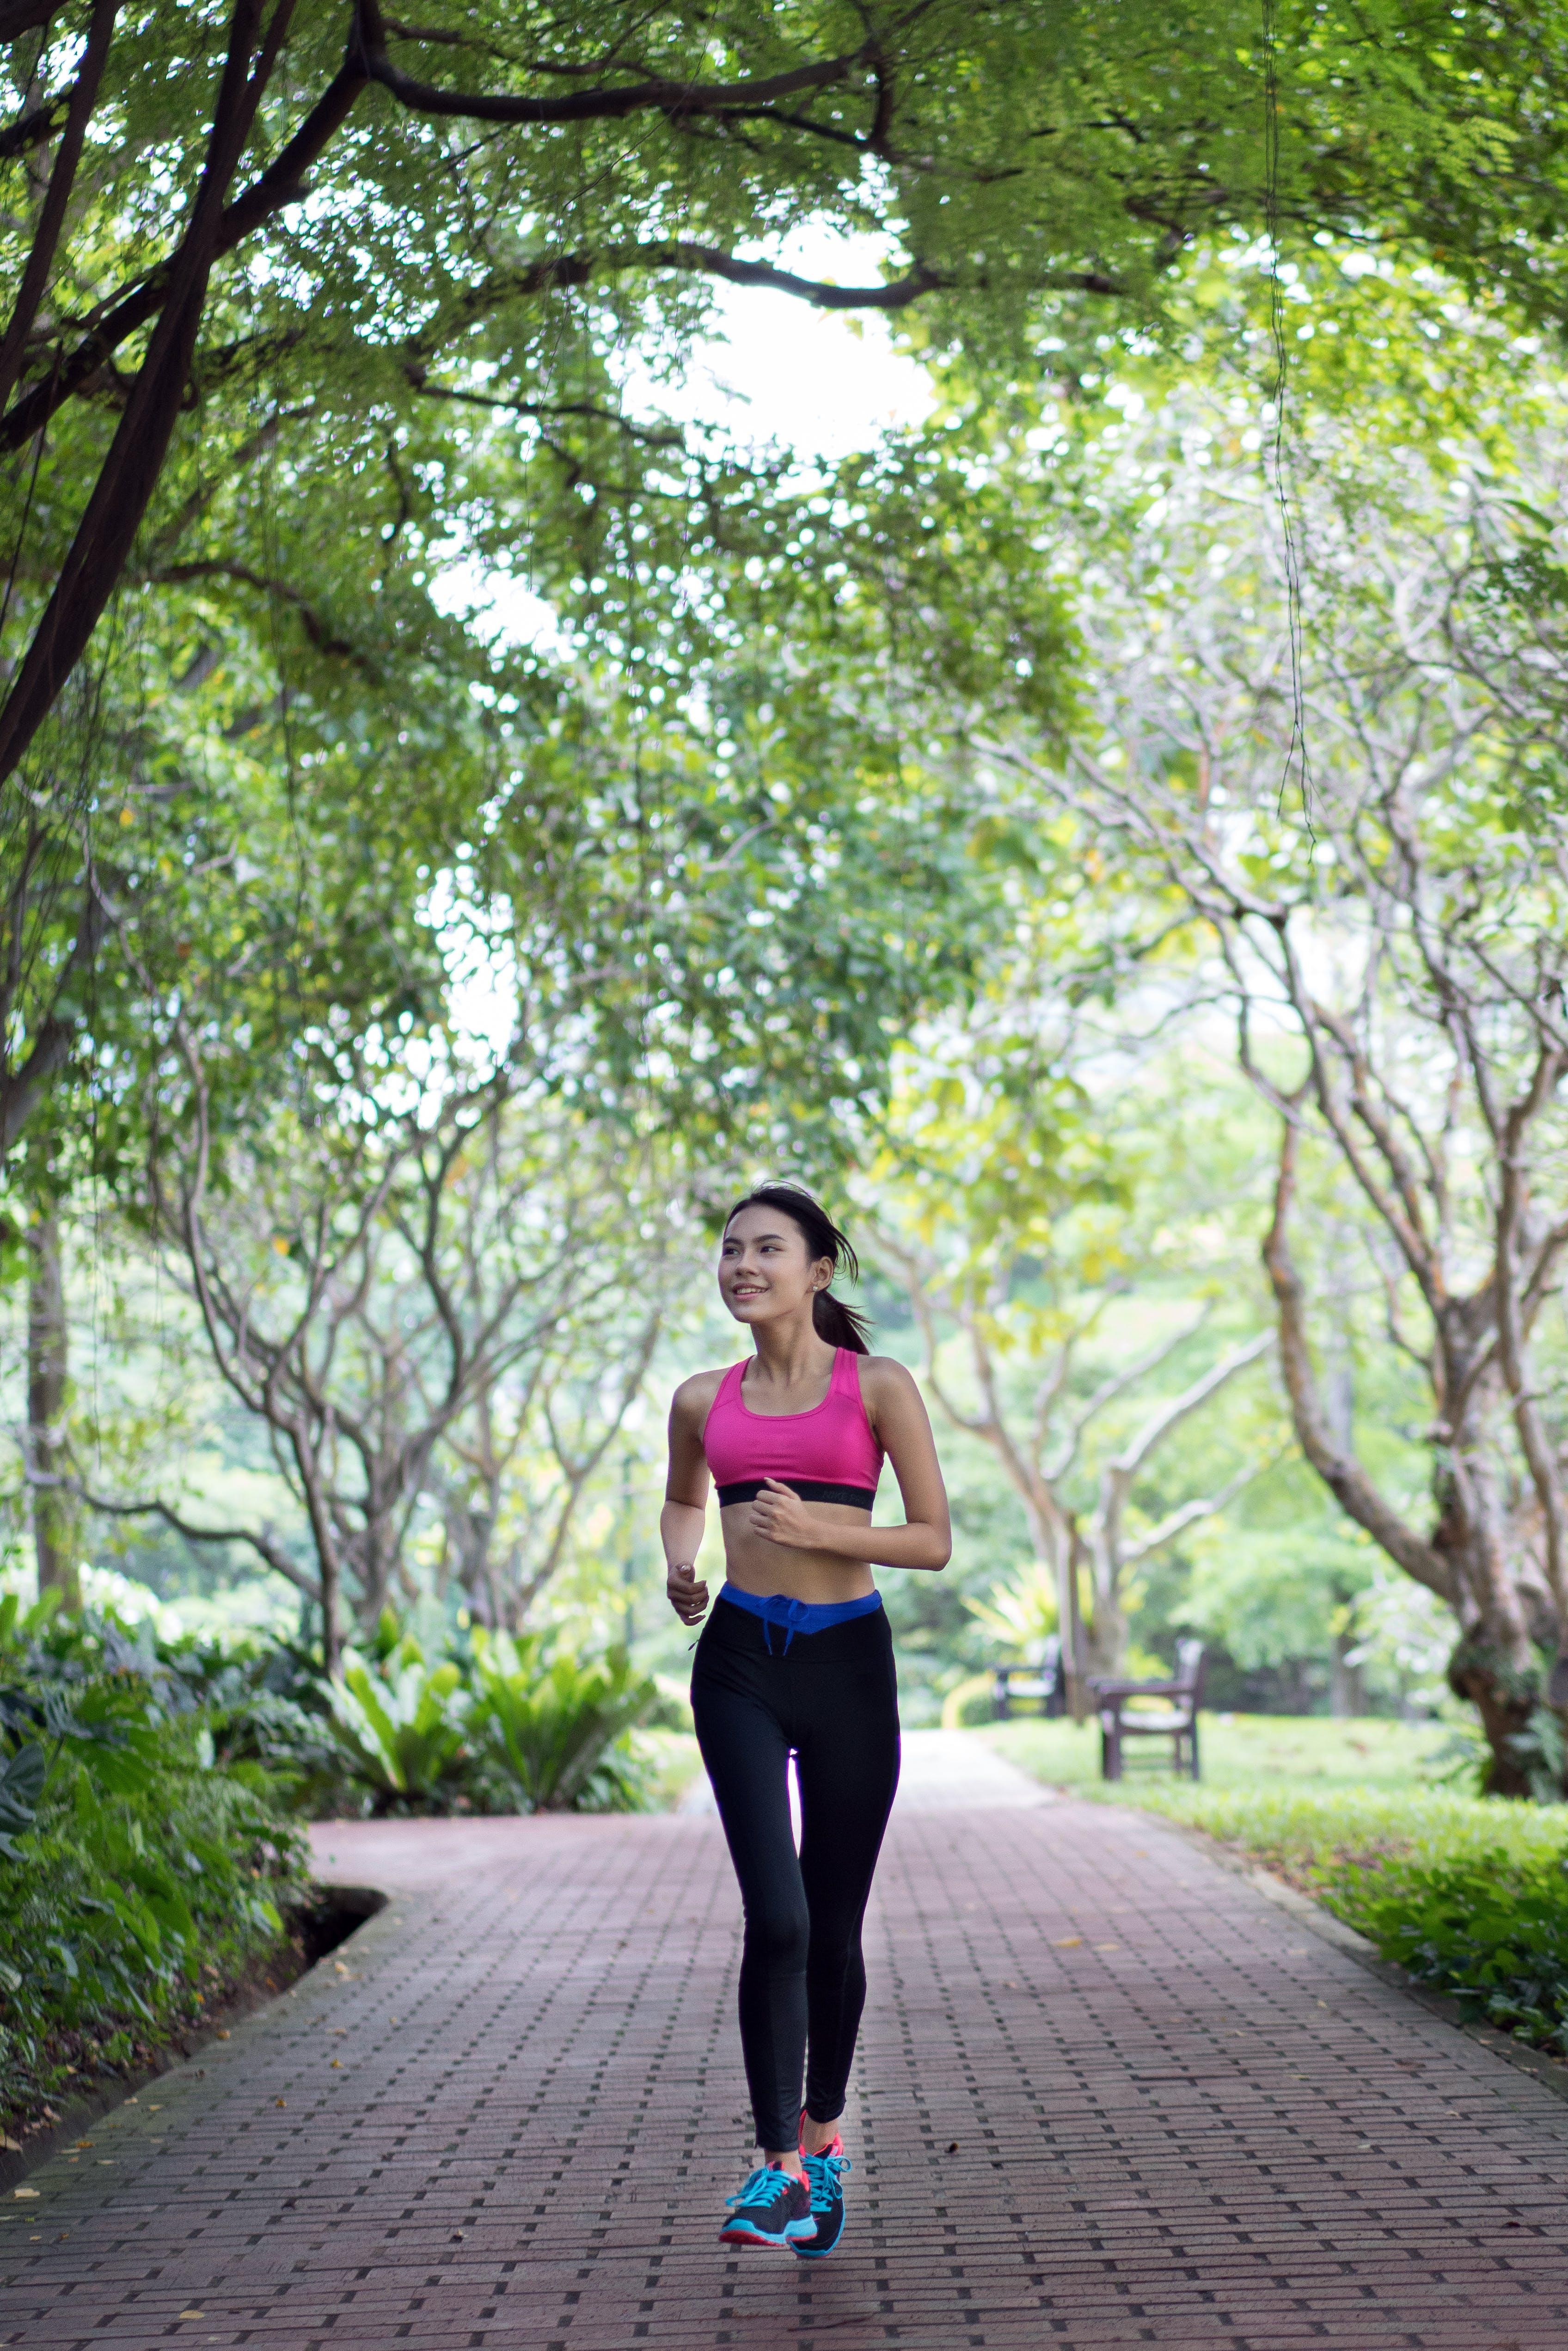 Kostenloses Stock Foto zu fitness, frau, joggen, lauf